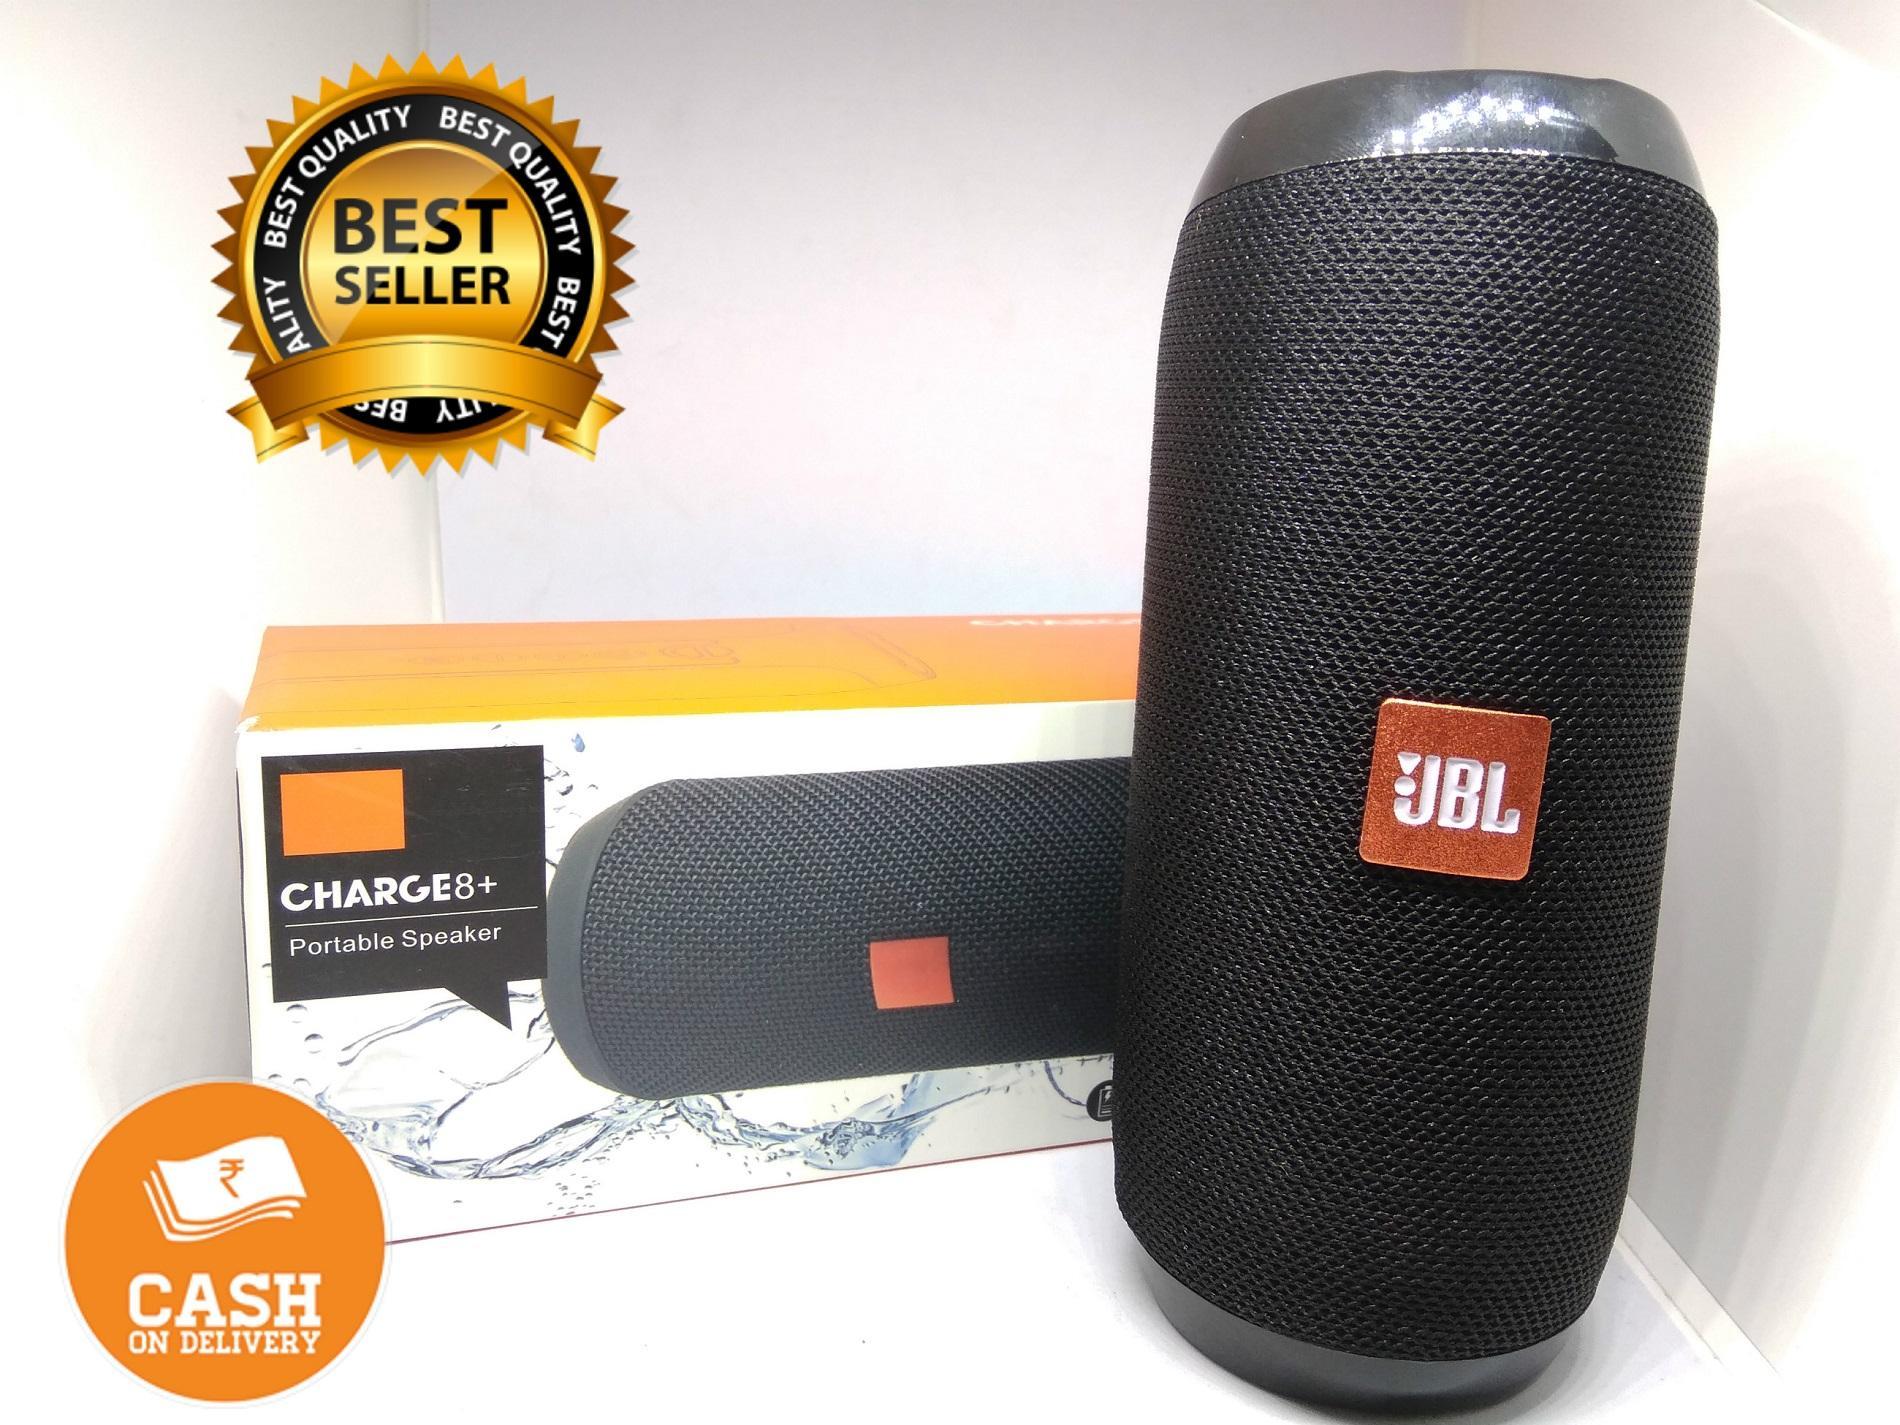 Kelebihan Speaker Bluetooth Jbl Powerbank H3 Biru Terkini Daftar Xtreme Portable Wireless Charge 8 Charge8